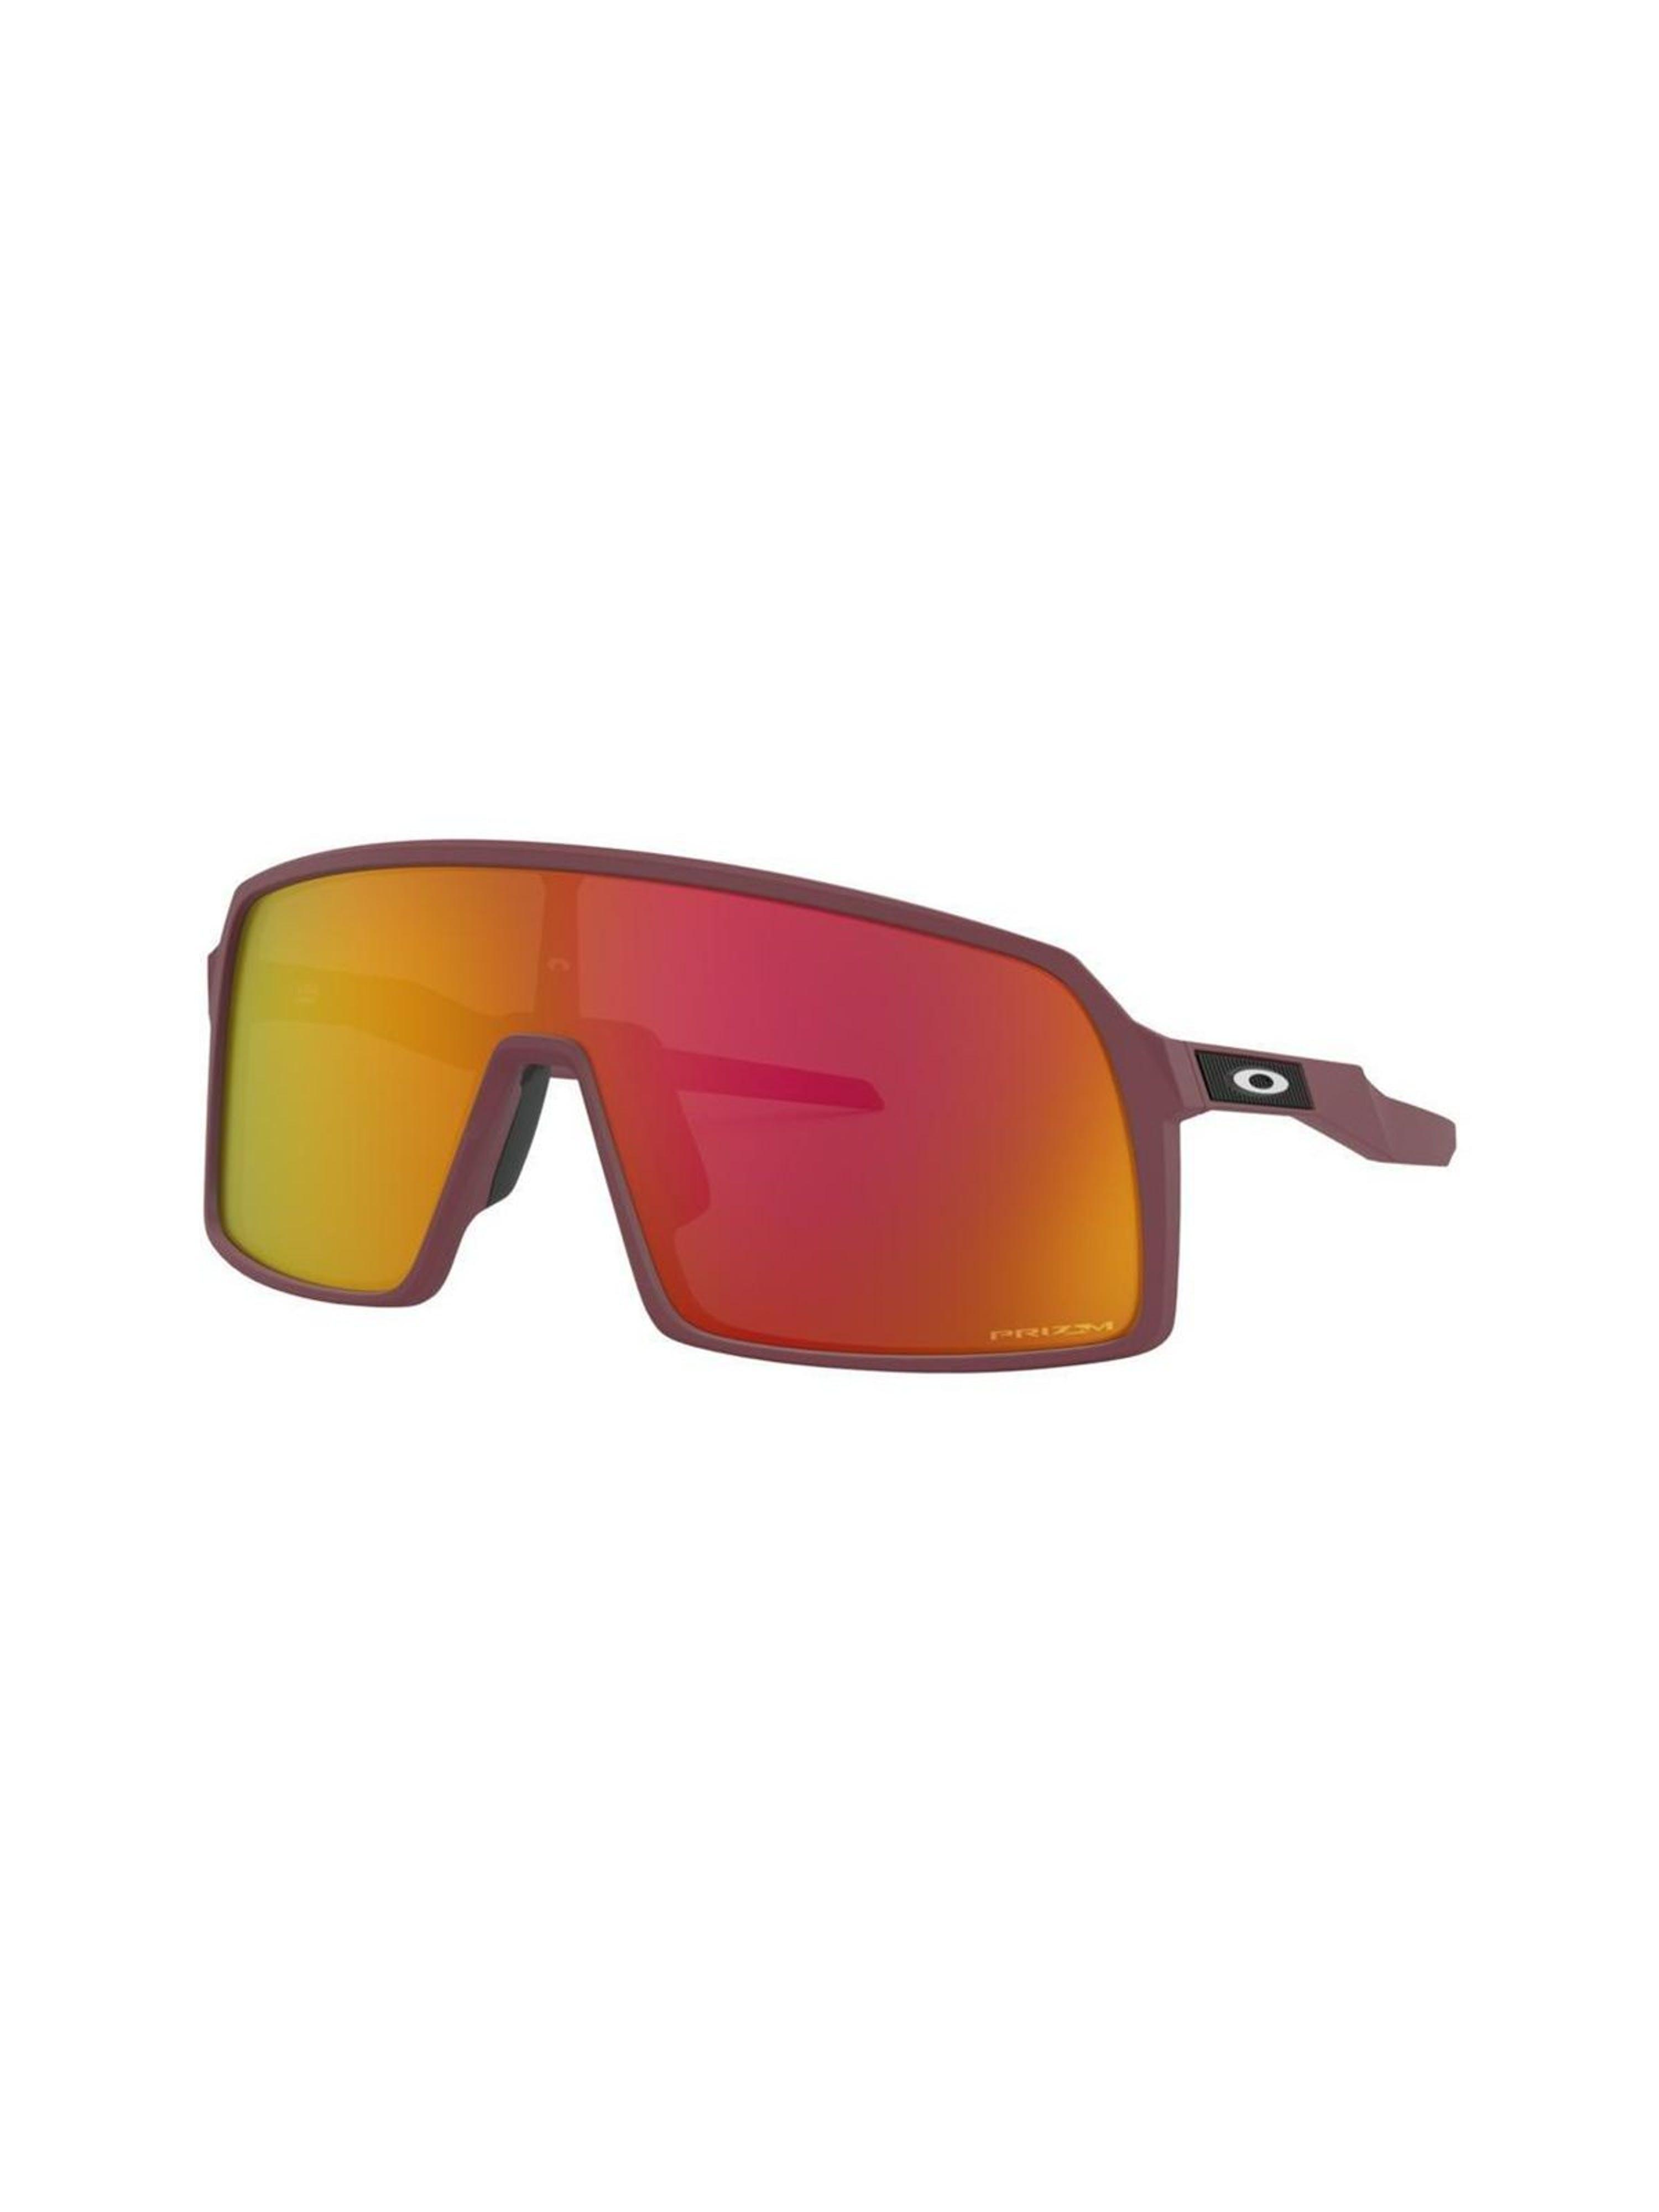 Hatchet Outdoor Supply Co. Brooklyn Sutro Sunglasses  - Red